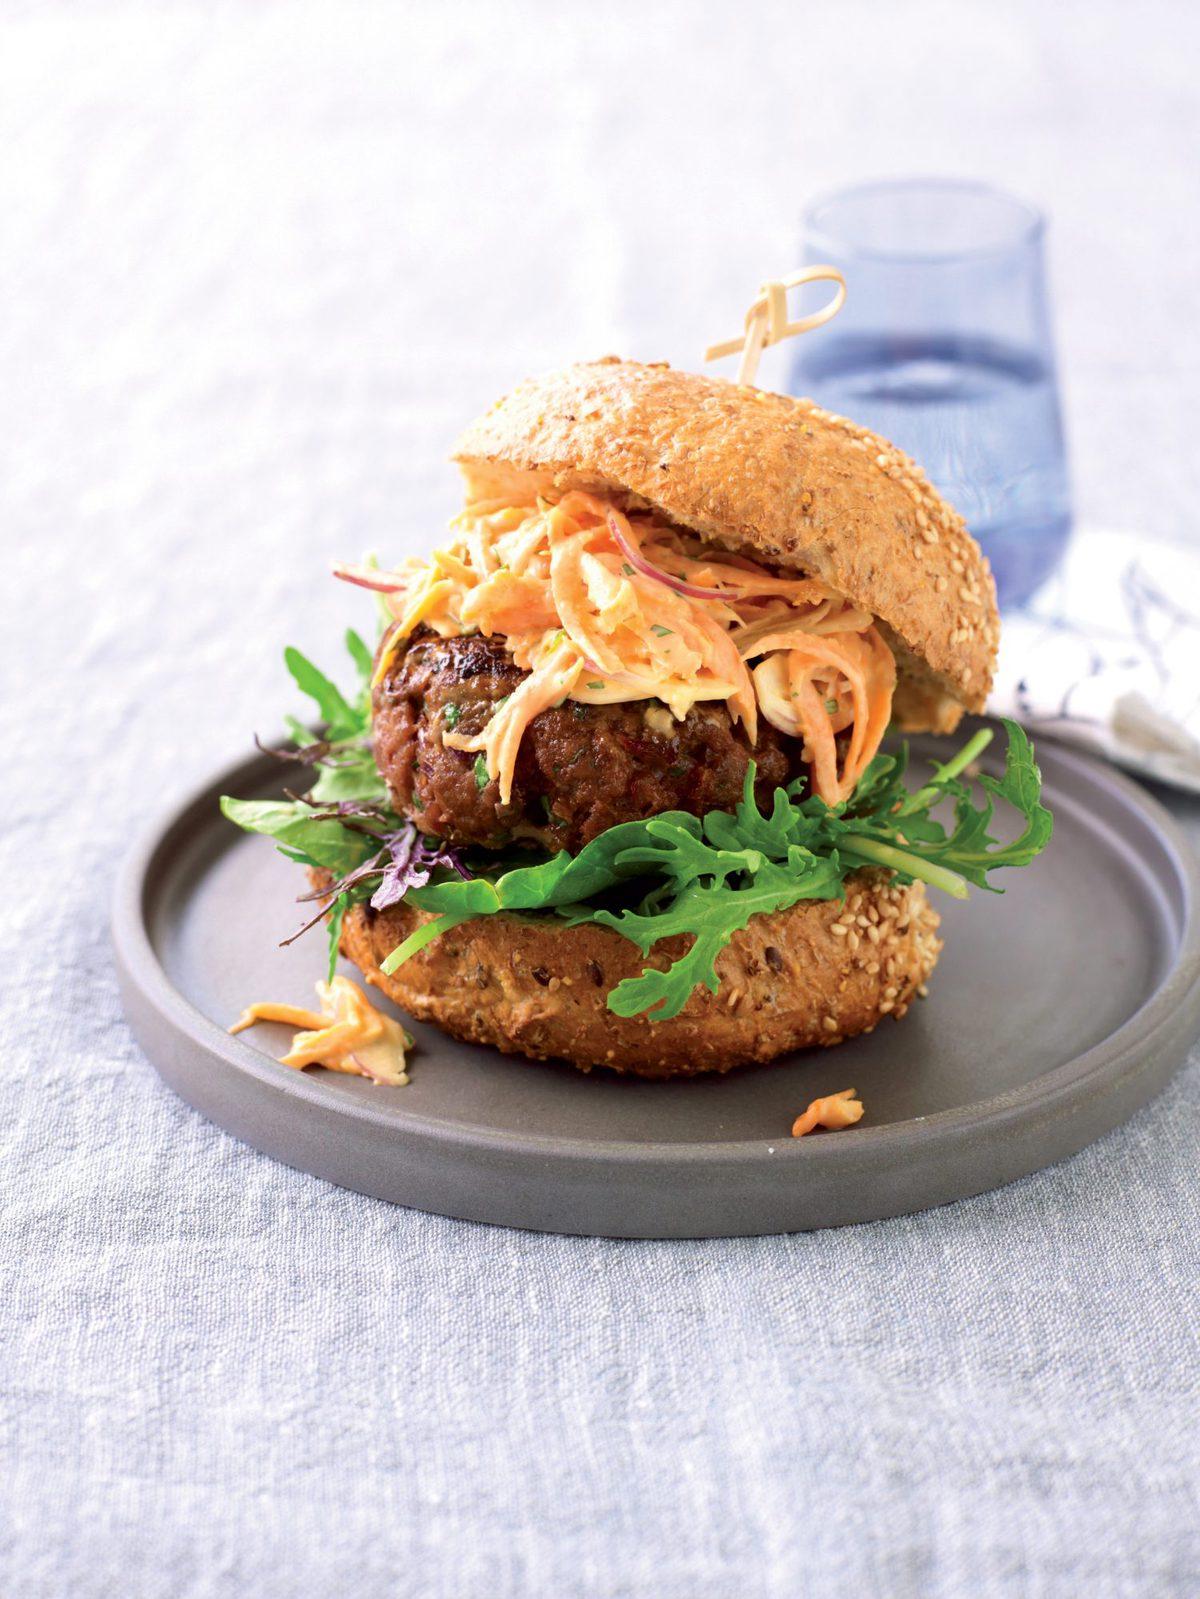 Thai beef burger